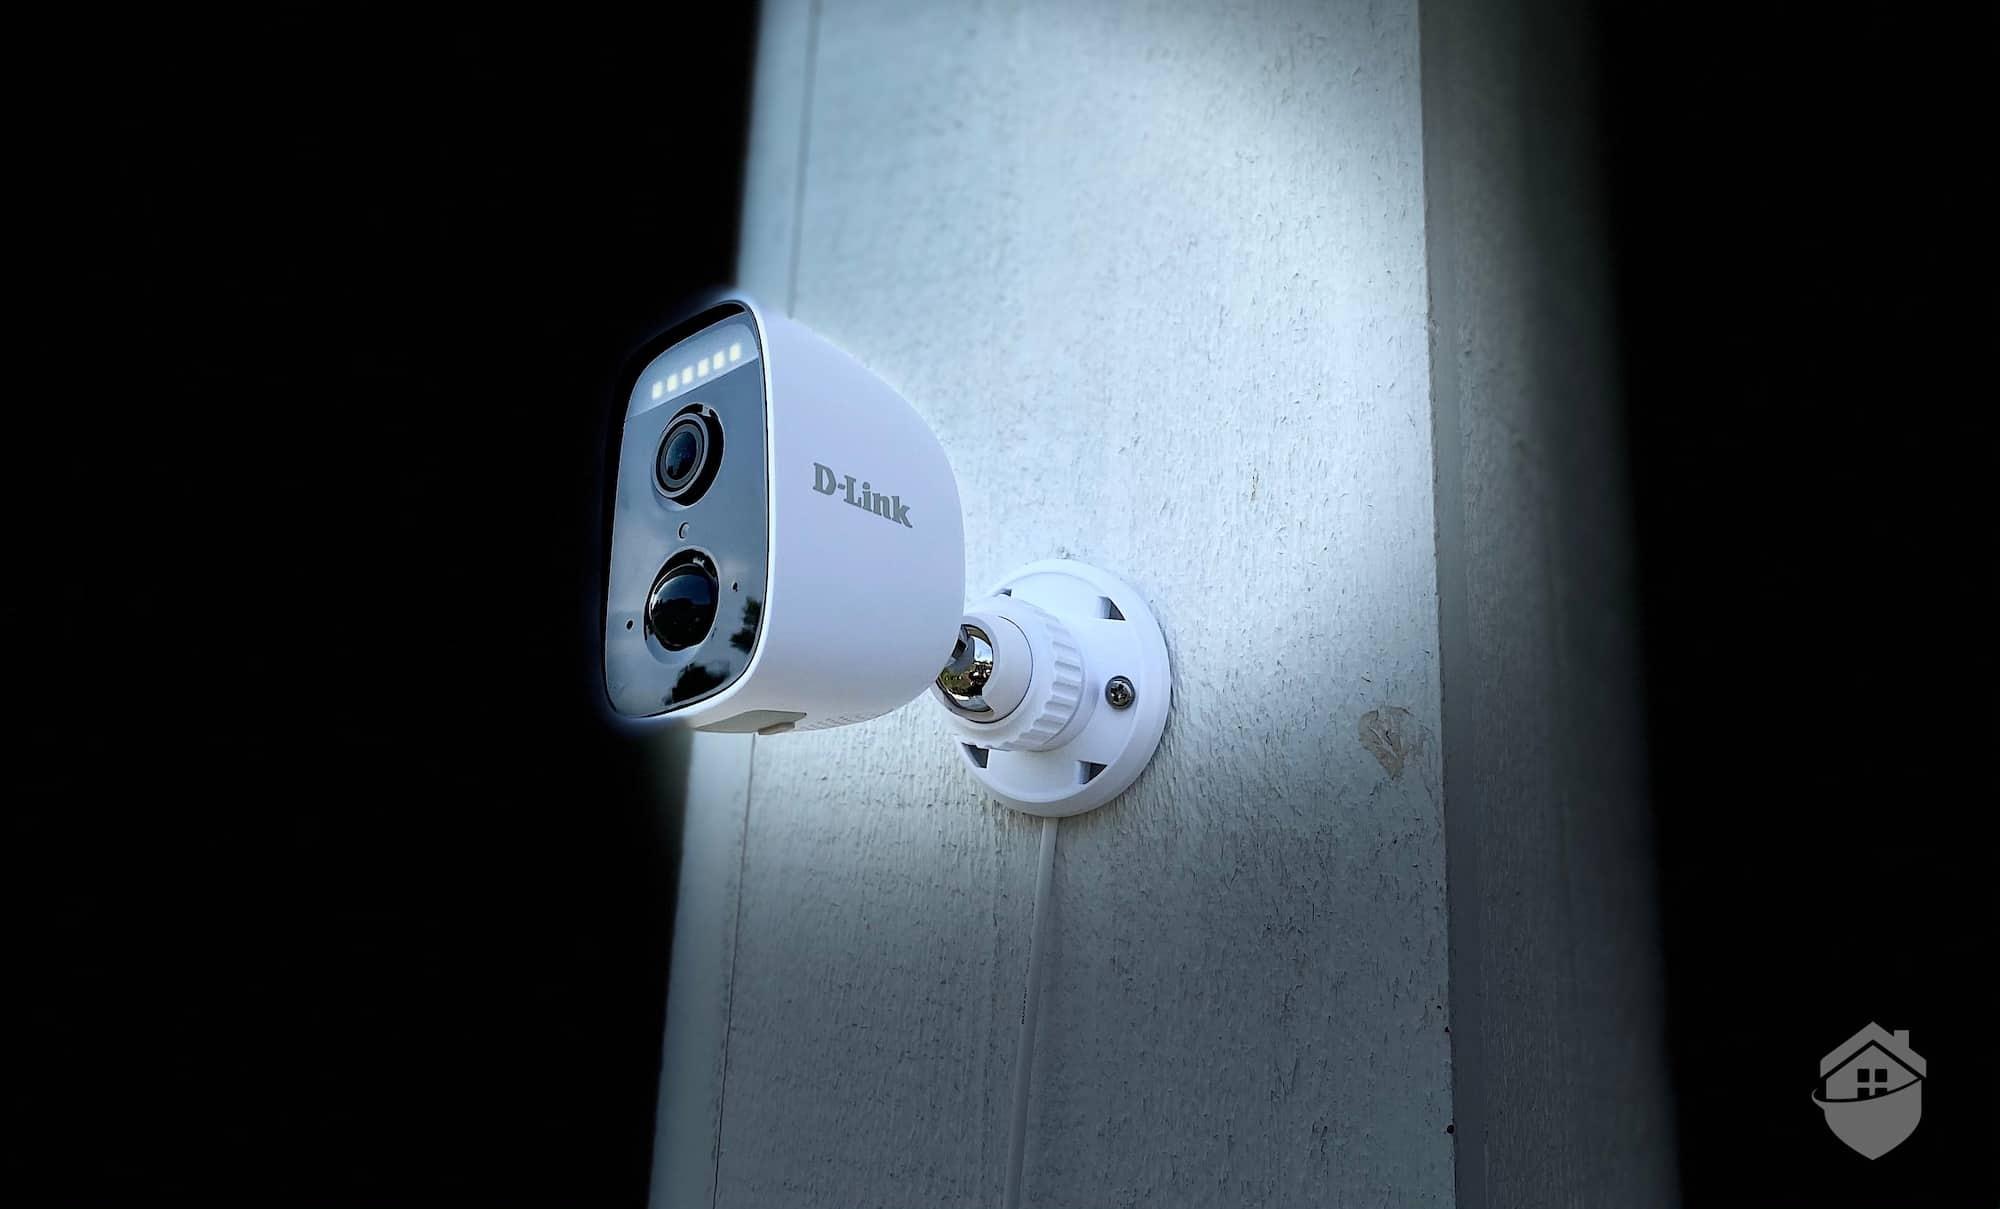 D-Link Camera at Night